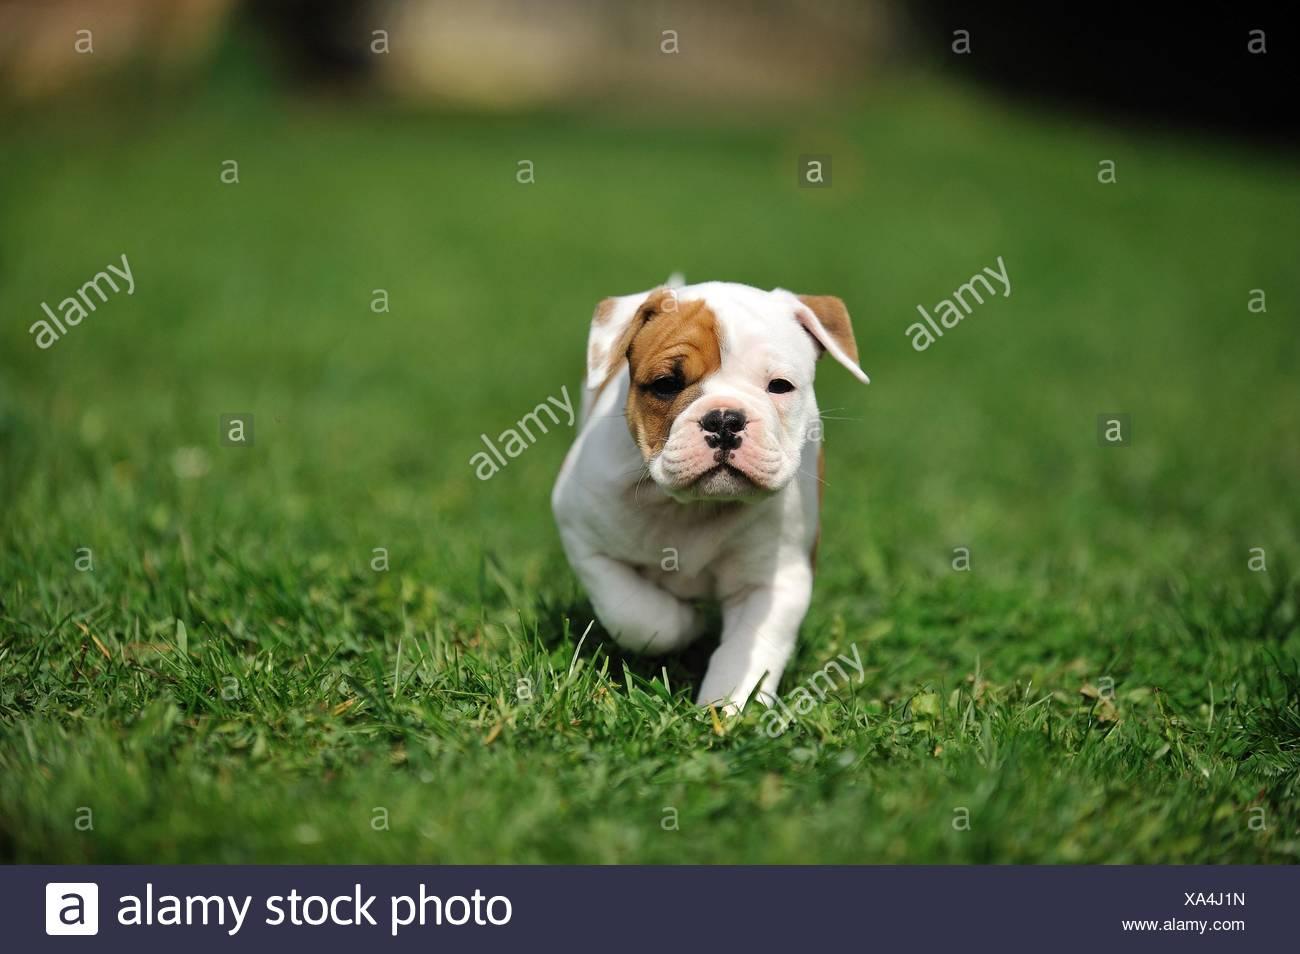 Continental Bulldog Puppy Stock Photo Alamy